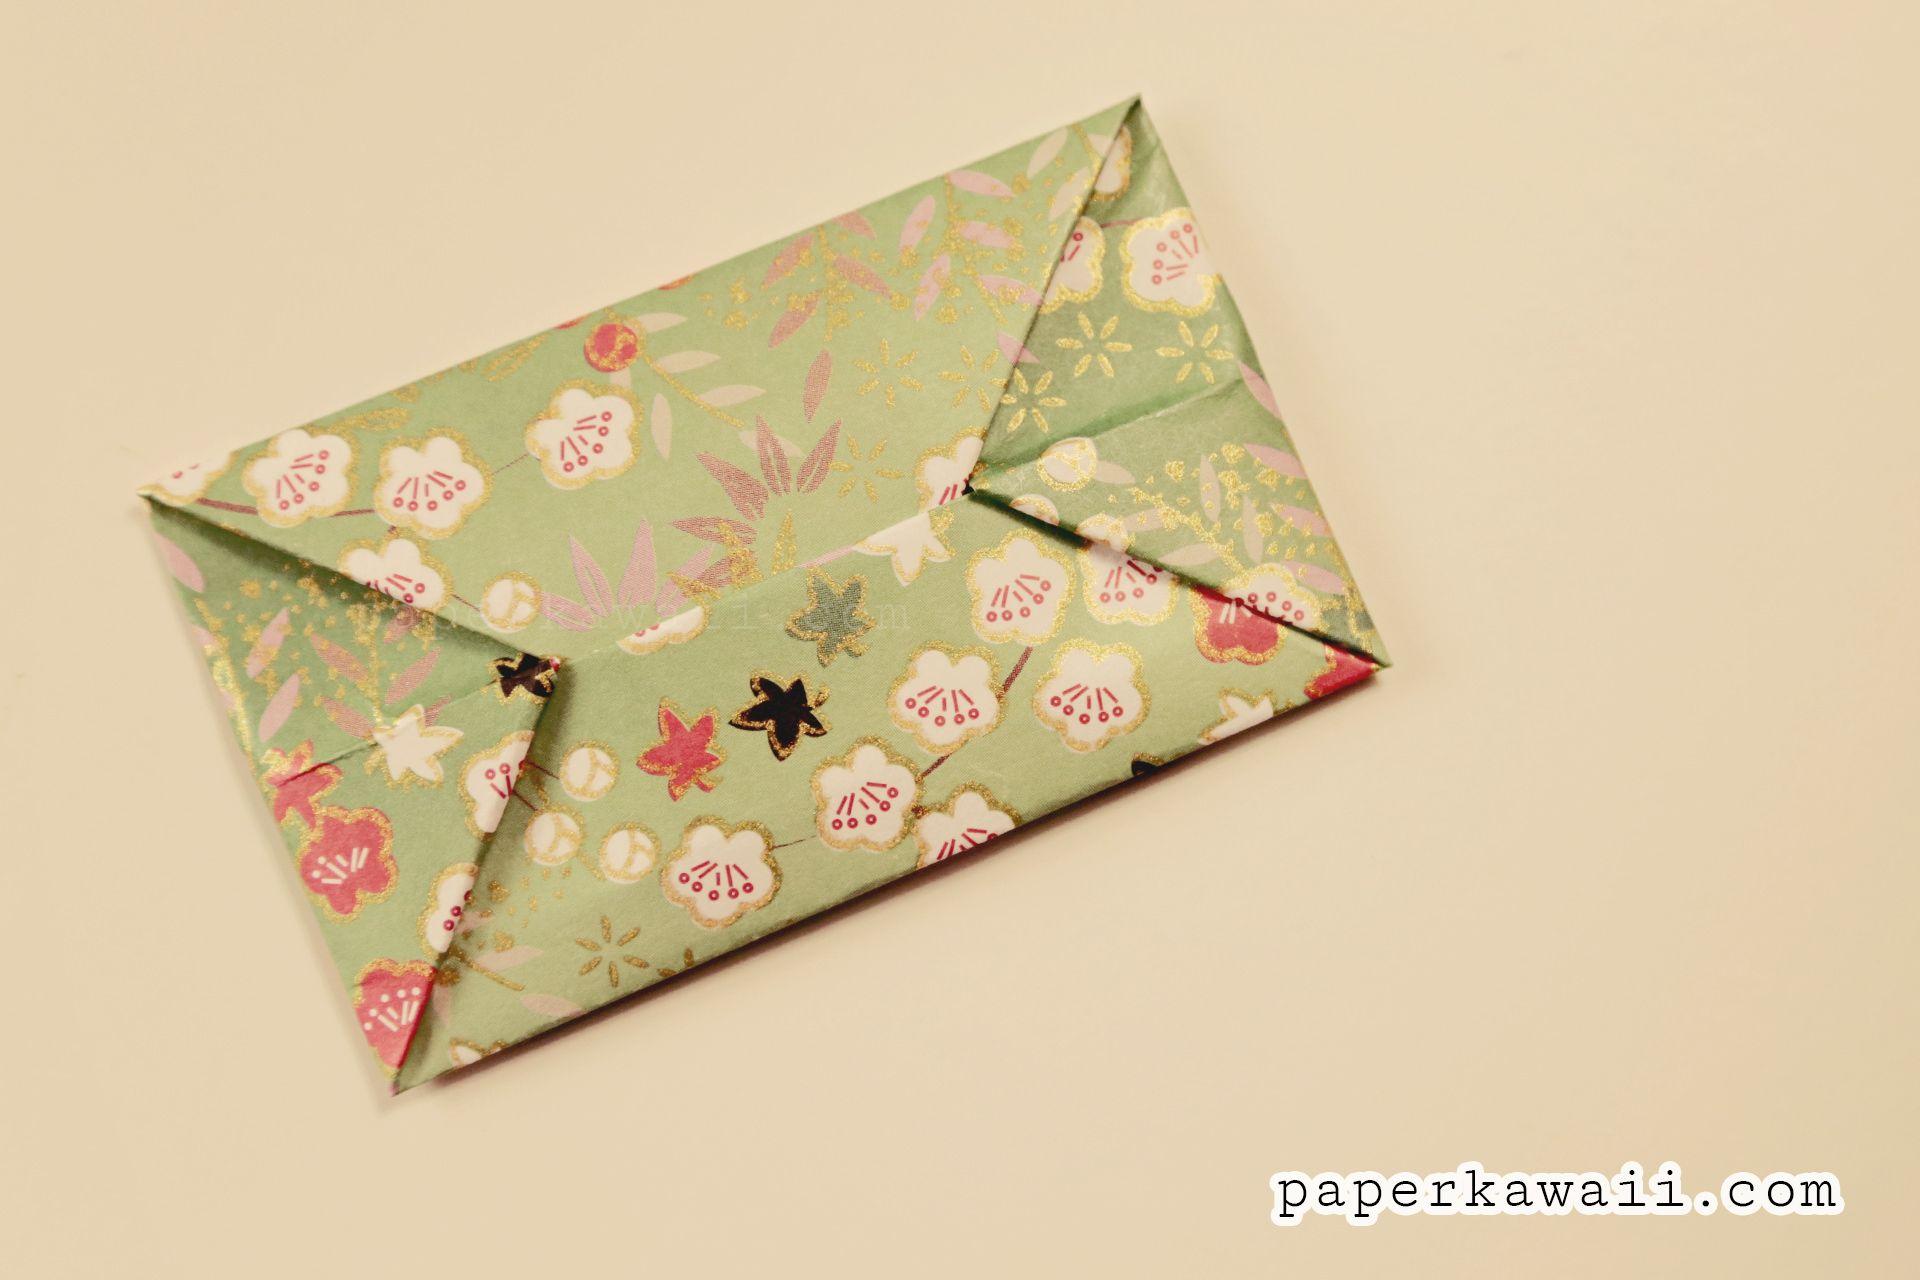 Easy Origami Envelope Tutorial | Origami envelope, Easy ... - photo#10